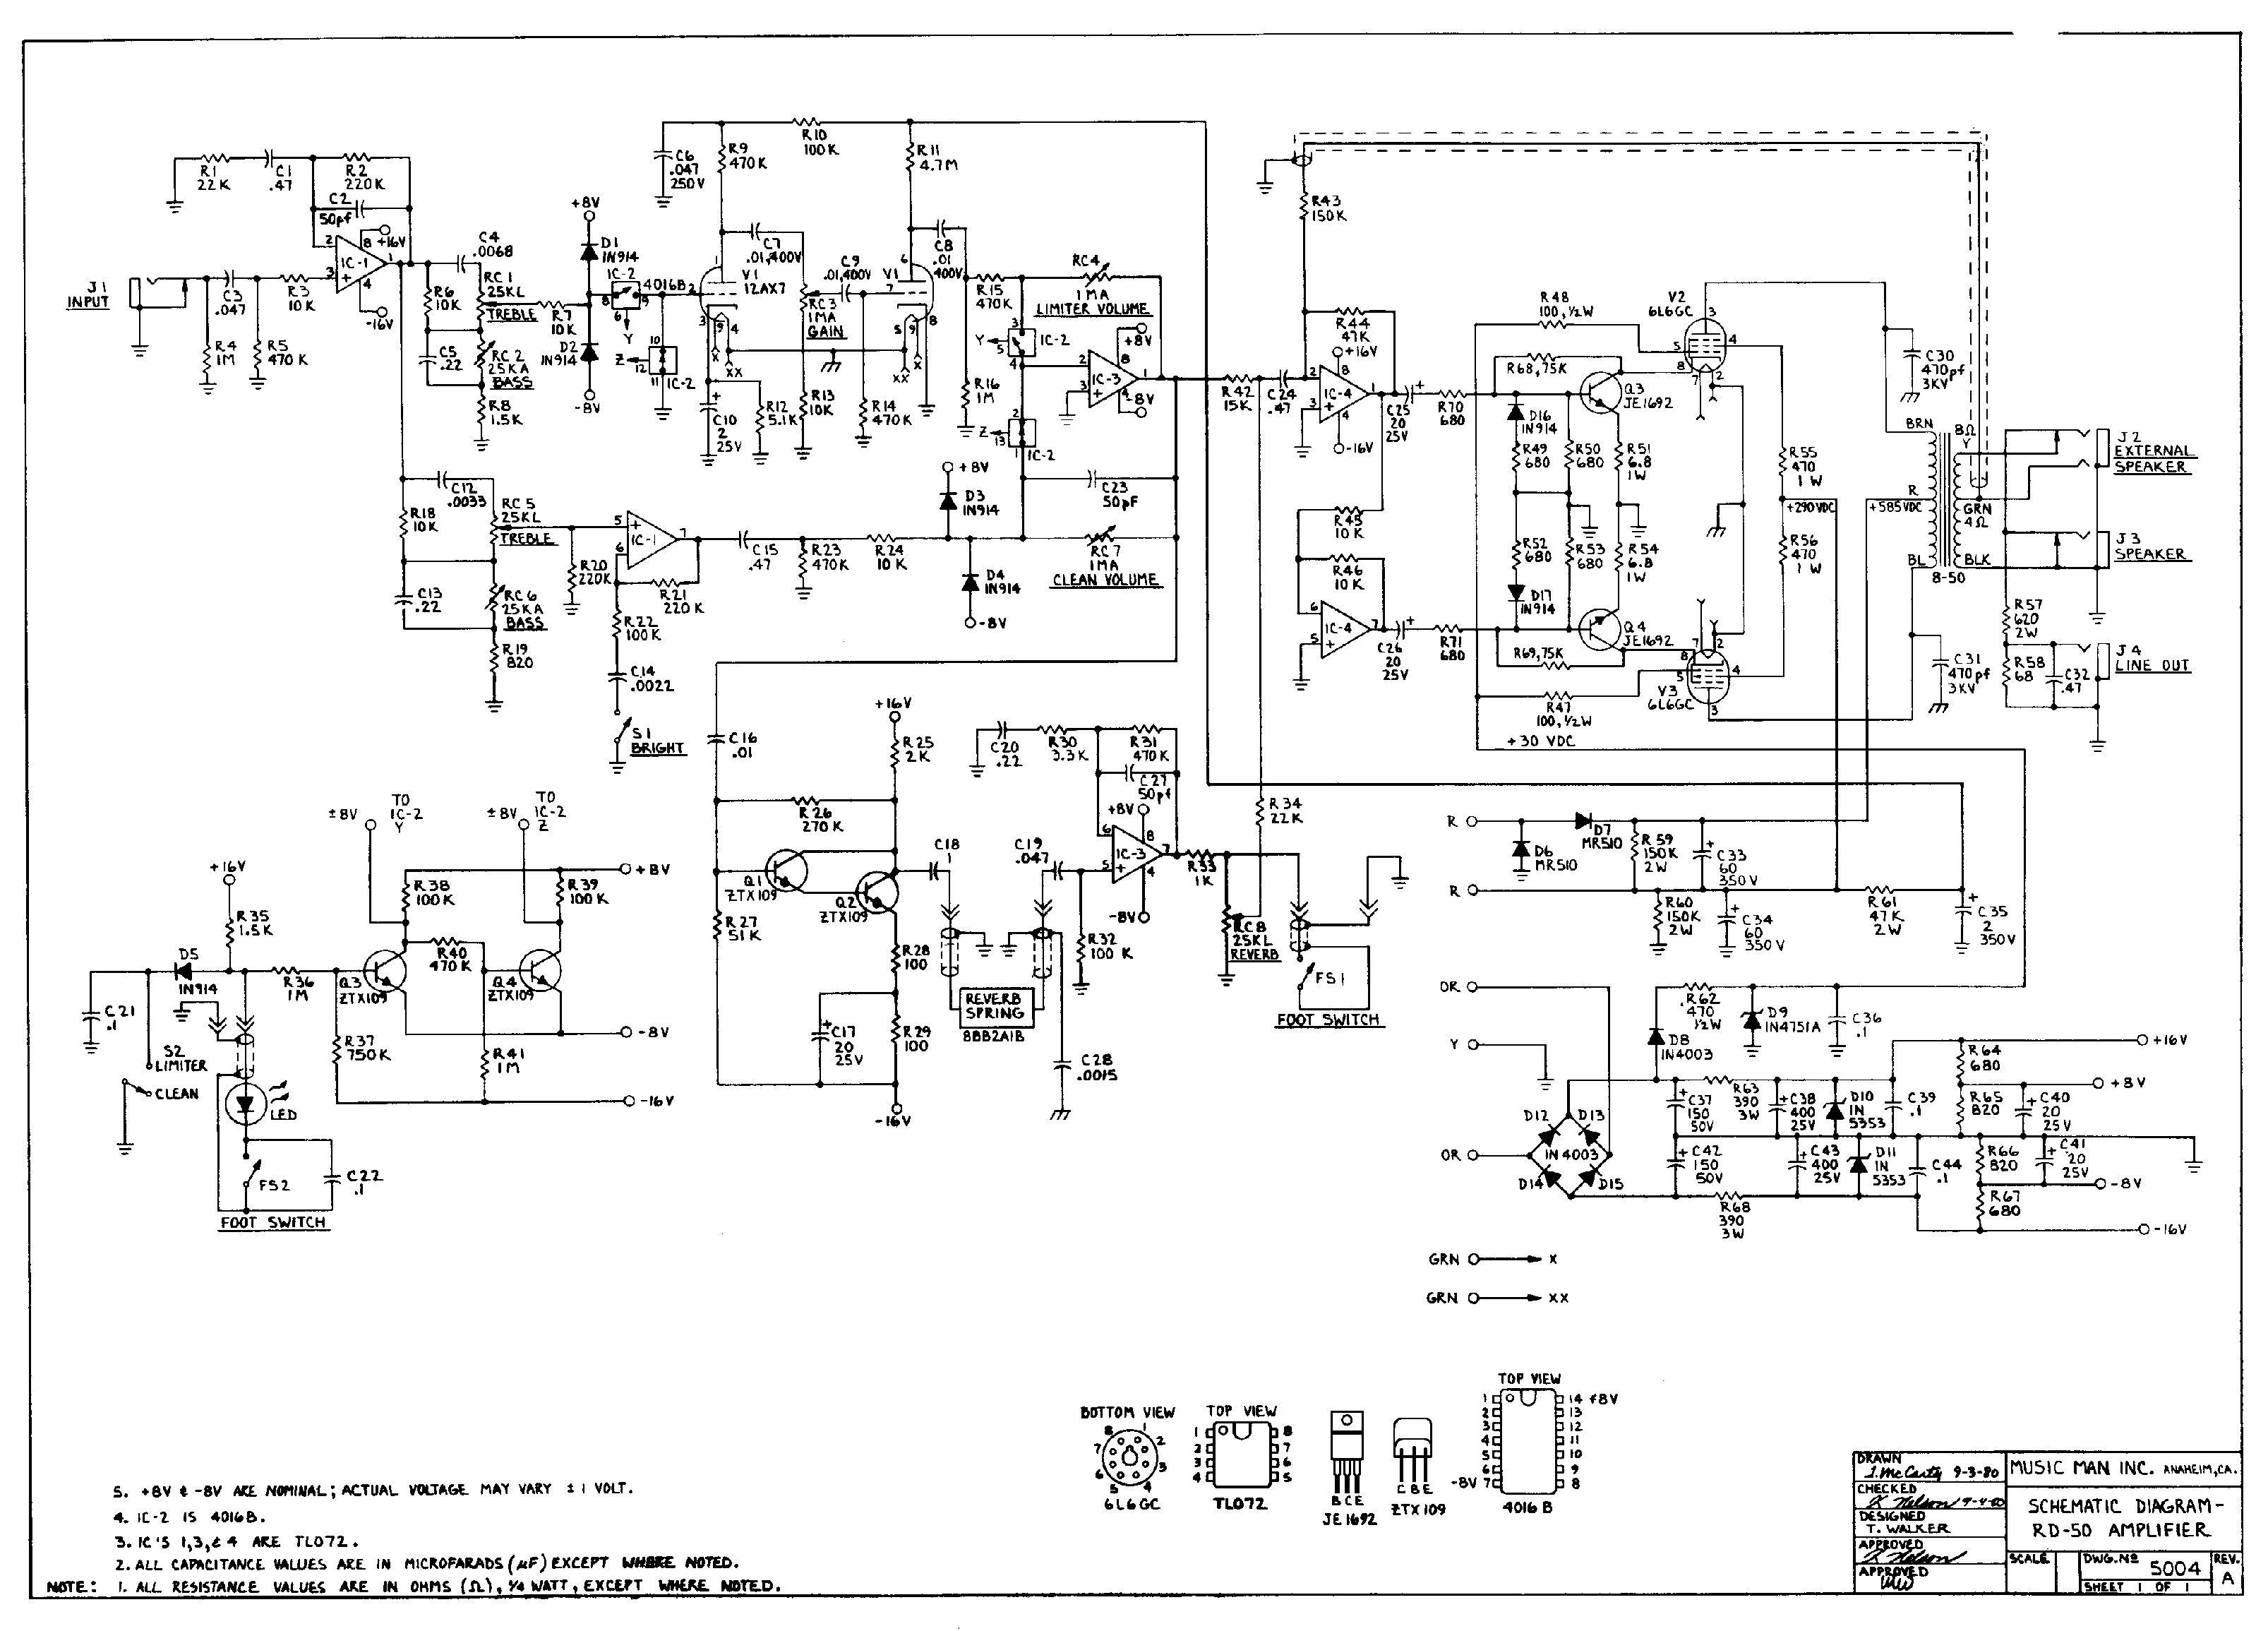 Diagramsample  Diagramformats  Diagramtemplate Check More